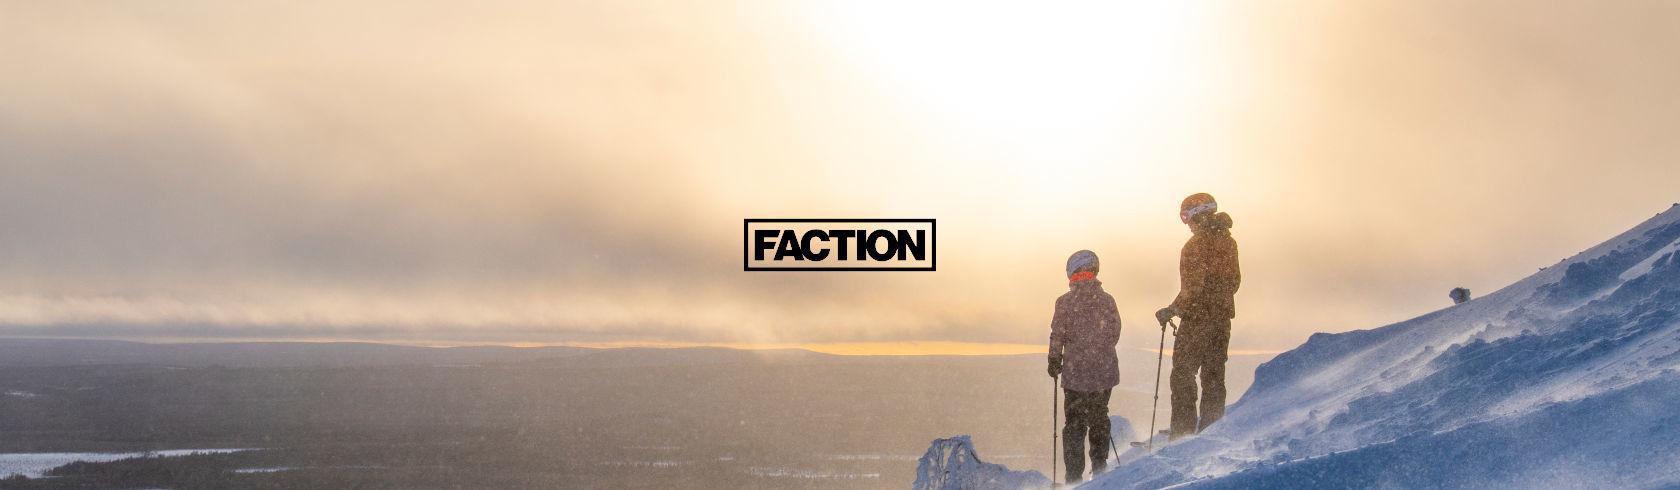 Faction Skis brand logo